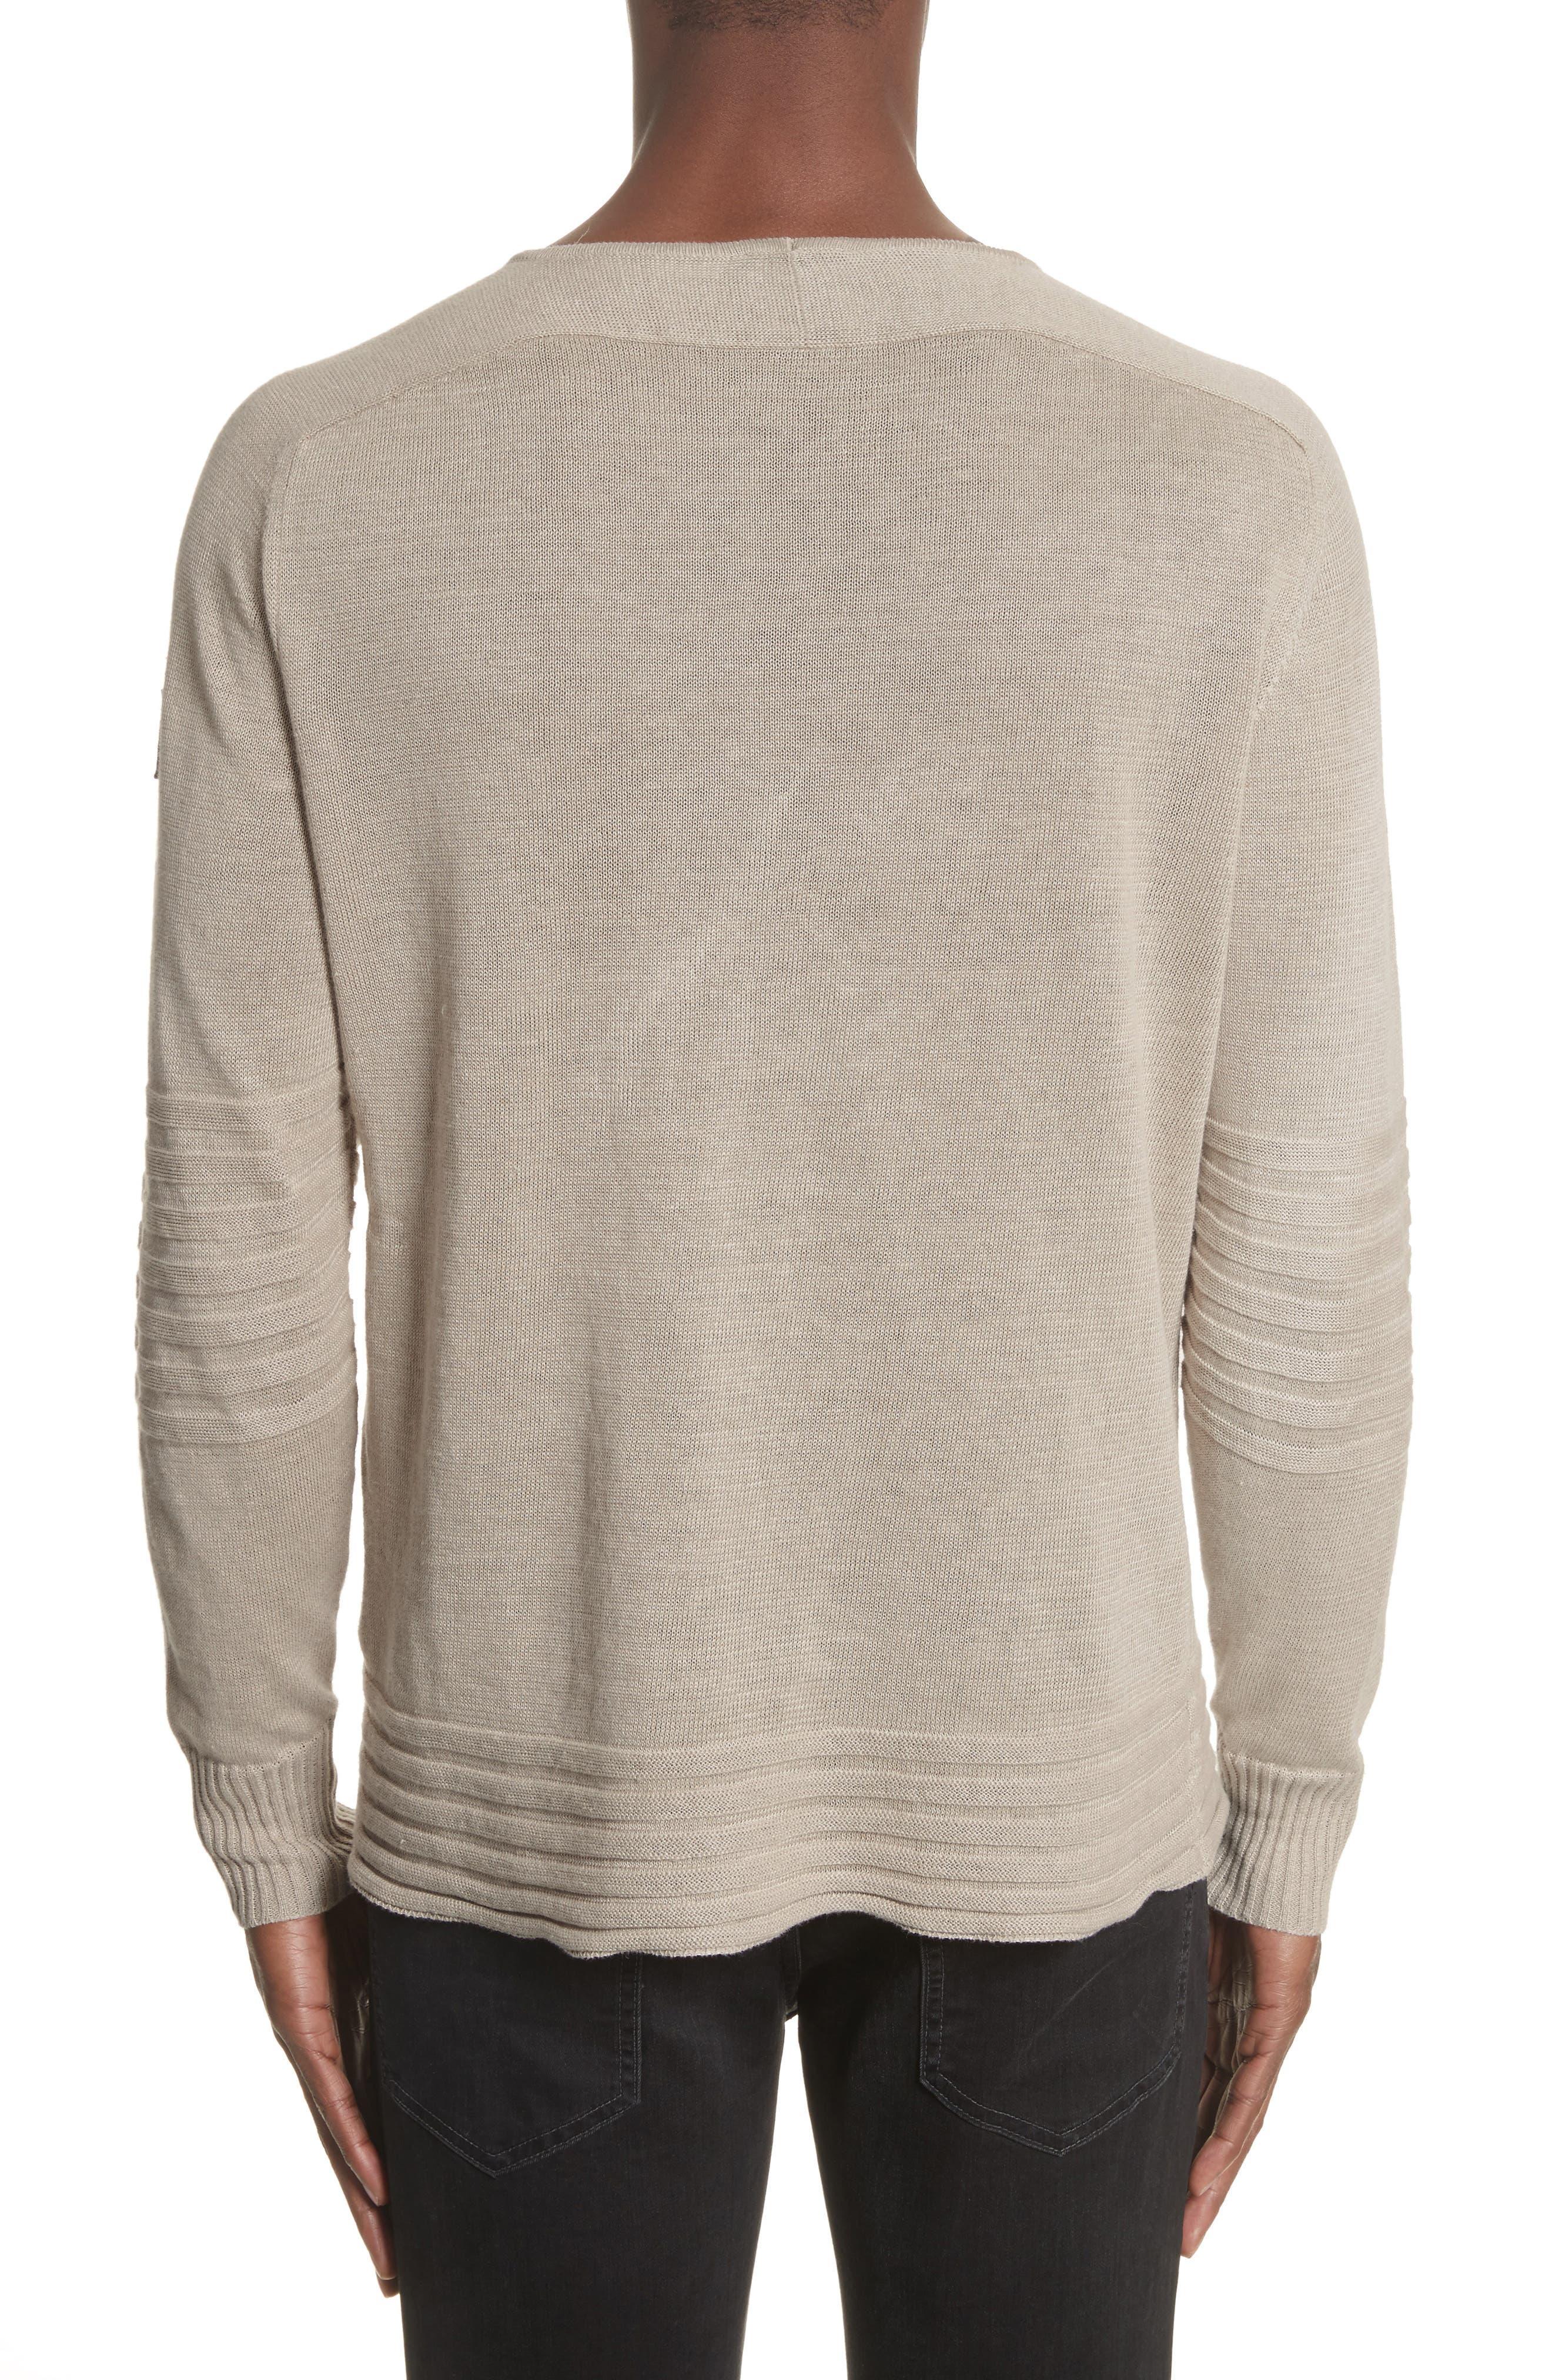 Exford Linen Crewneck Sweater,                             Alternate thumbnail 3, color,